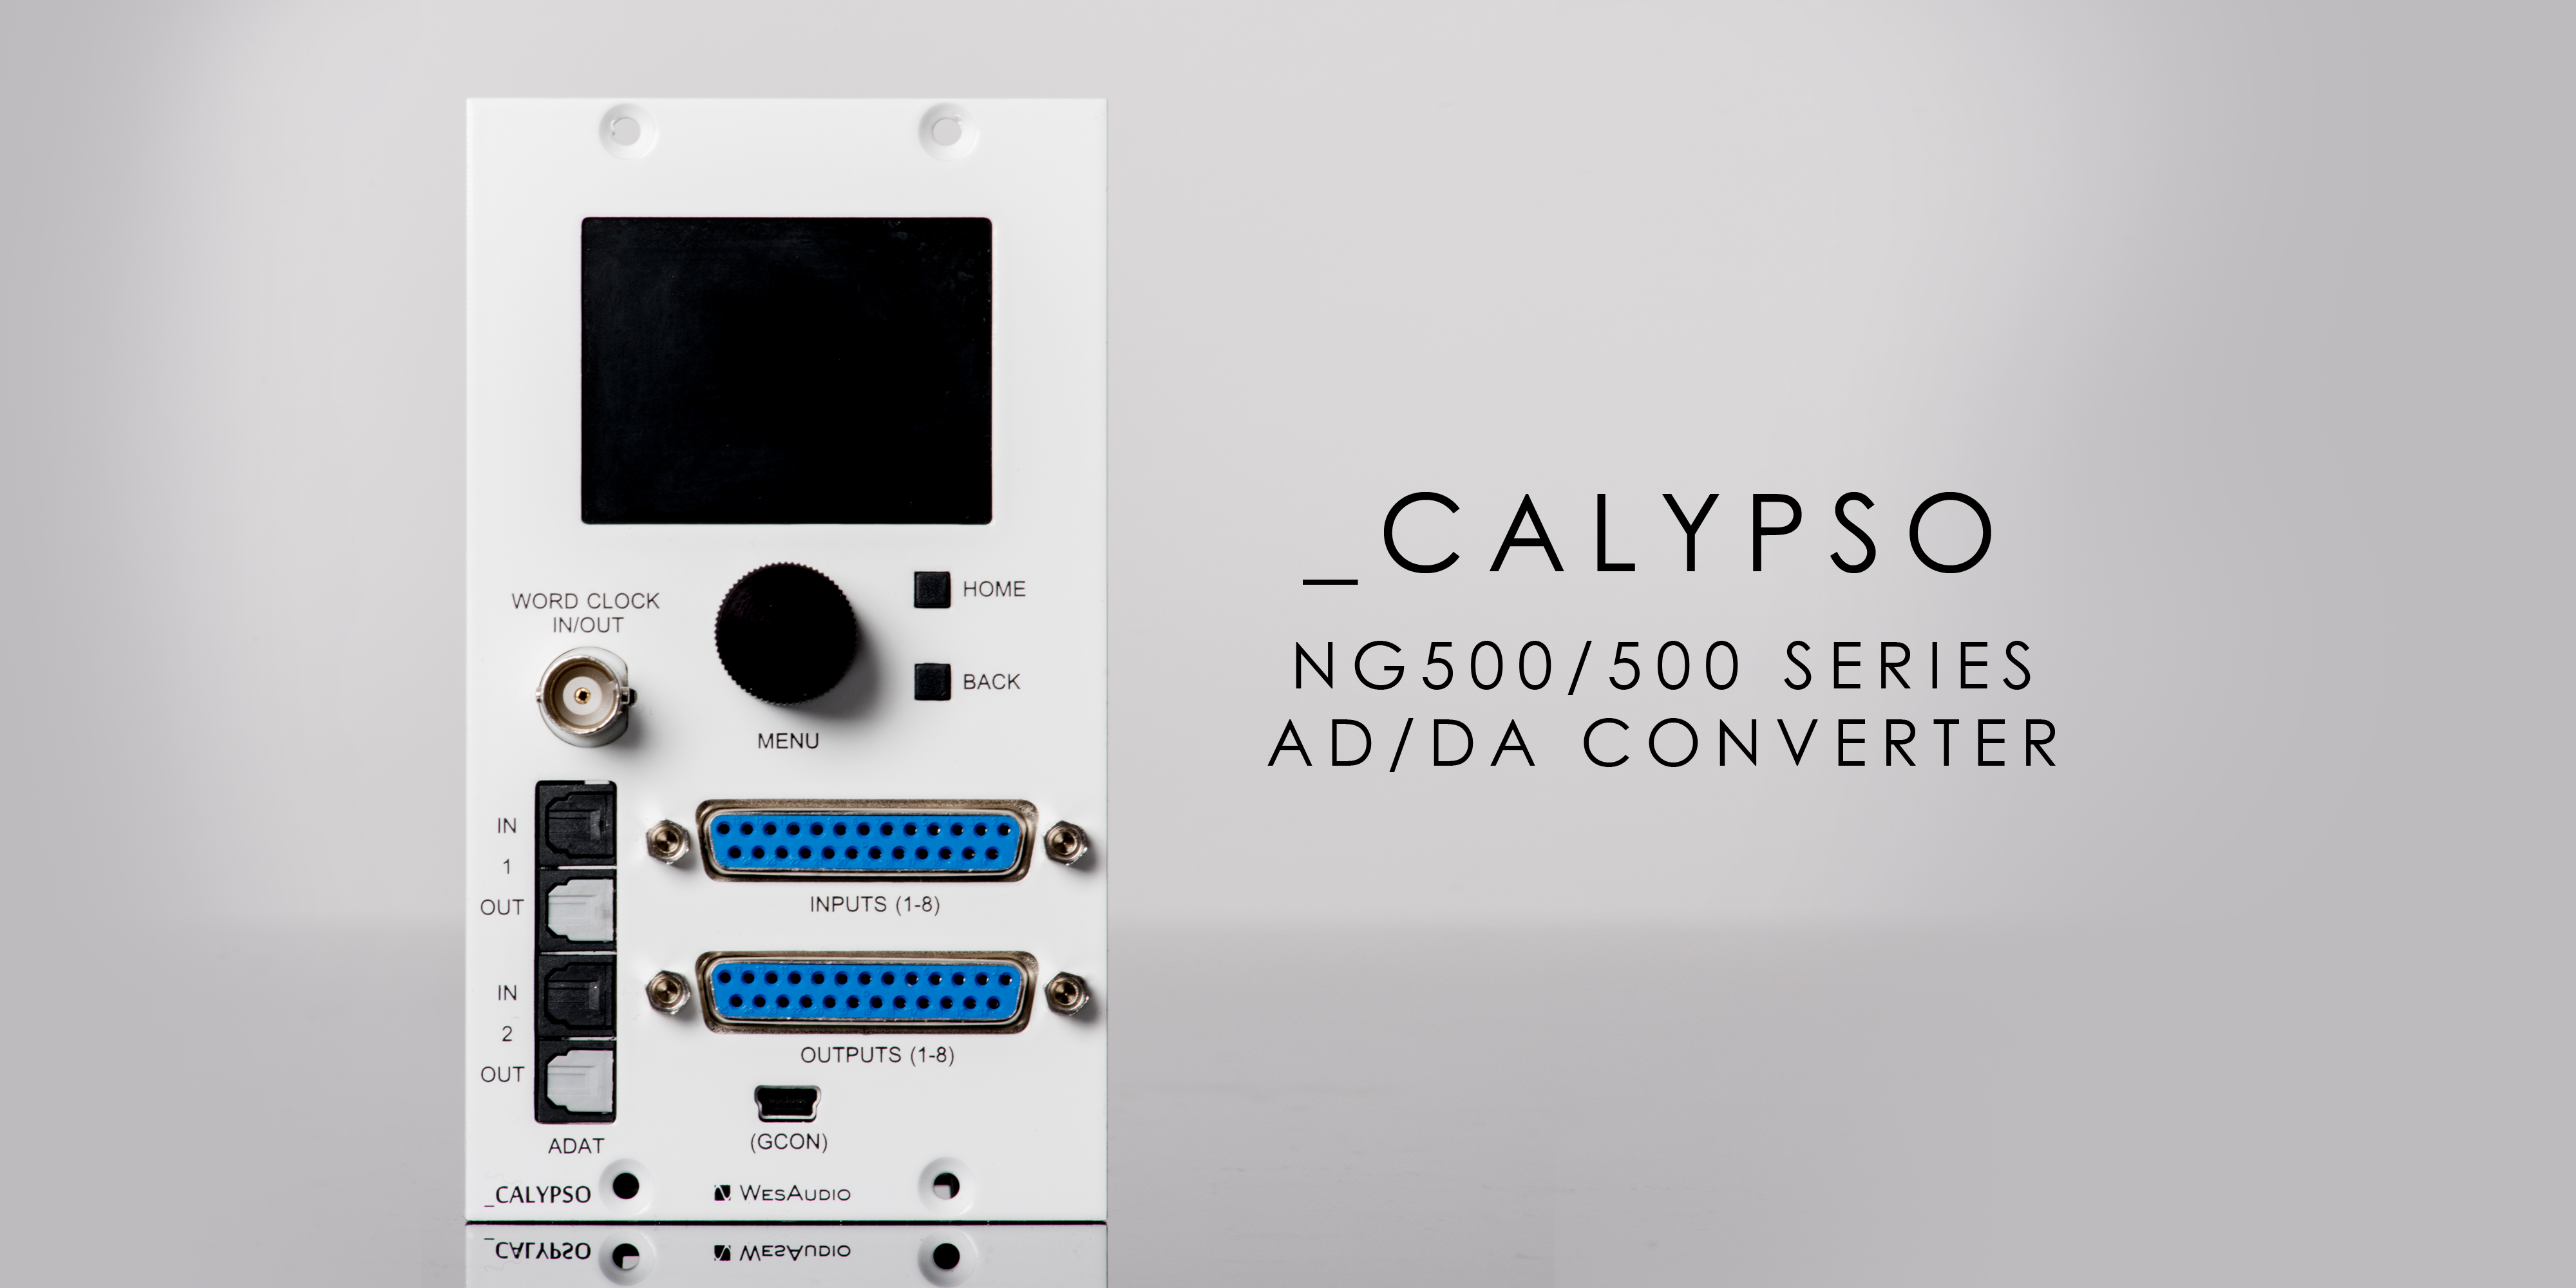 API500,VPR,ADコンバーター,DAコンバーター,AD/DA,ランチボックス,ルーティング,WesAudio,_Calypso